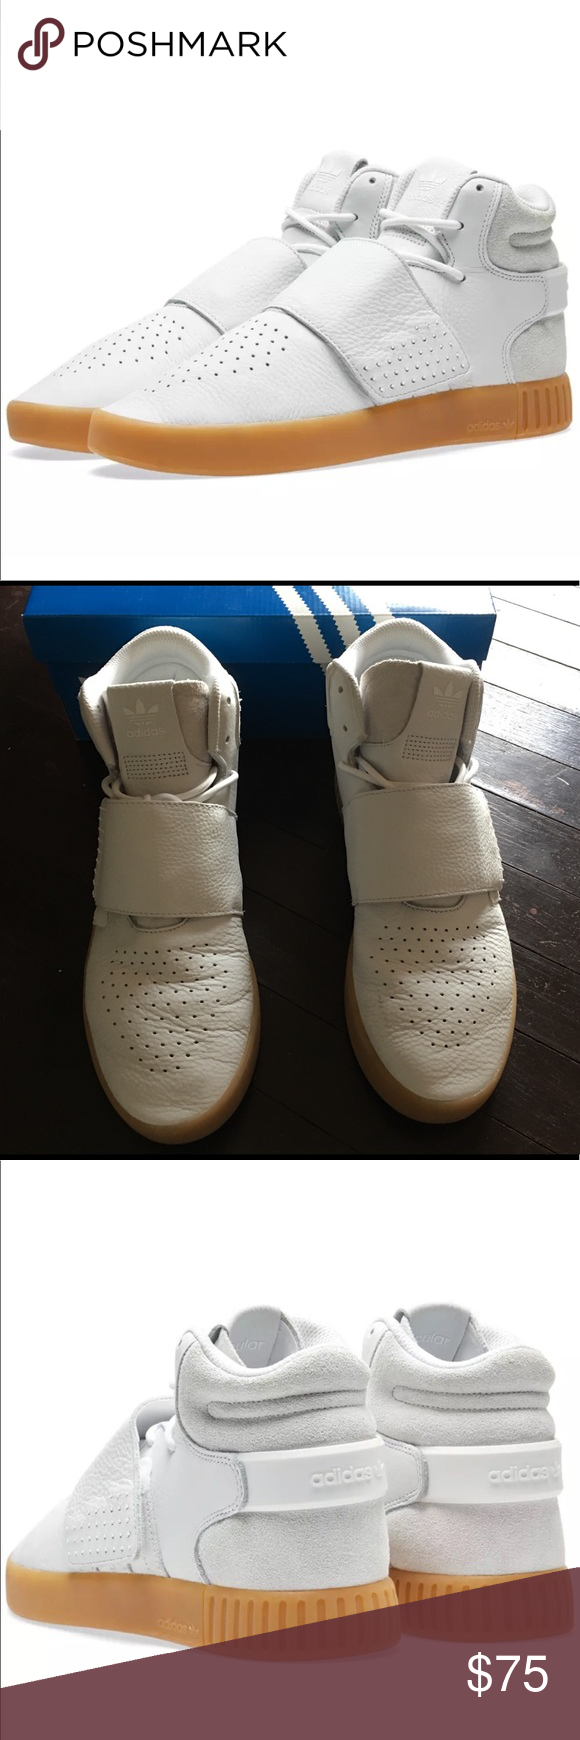 Uomo adidas tubulare invasore cinghia scarpe da ginnastica mio elegante sceglie